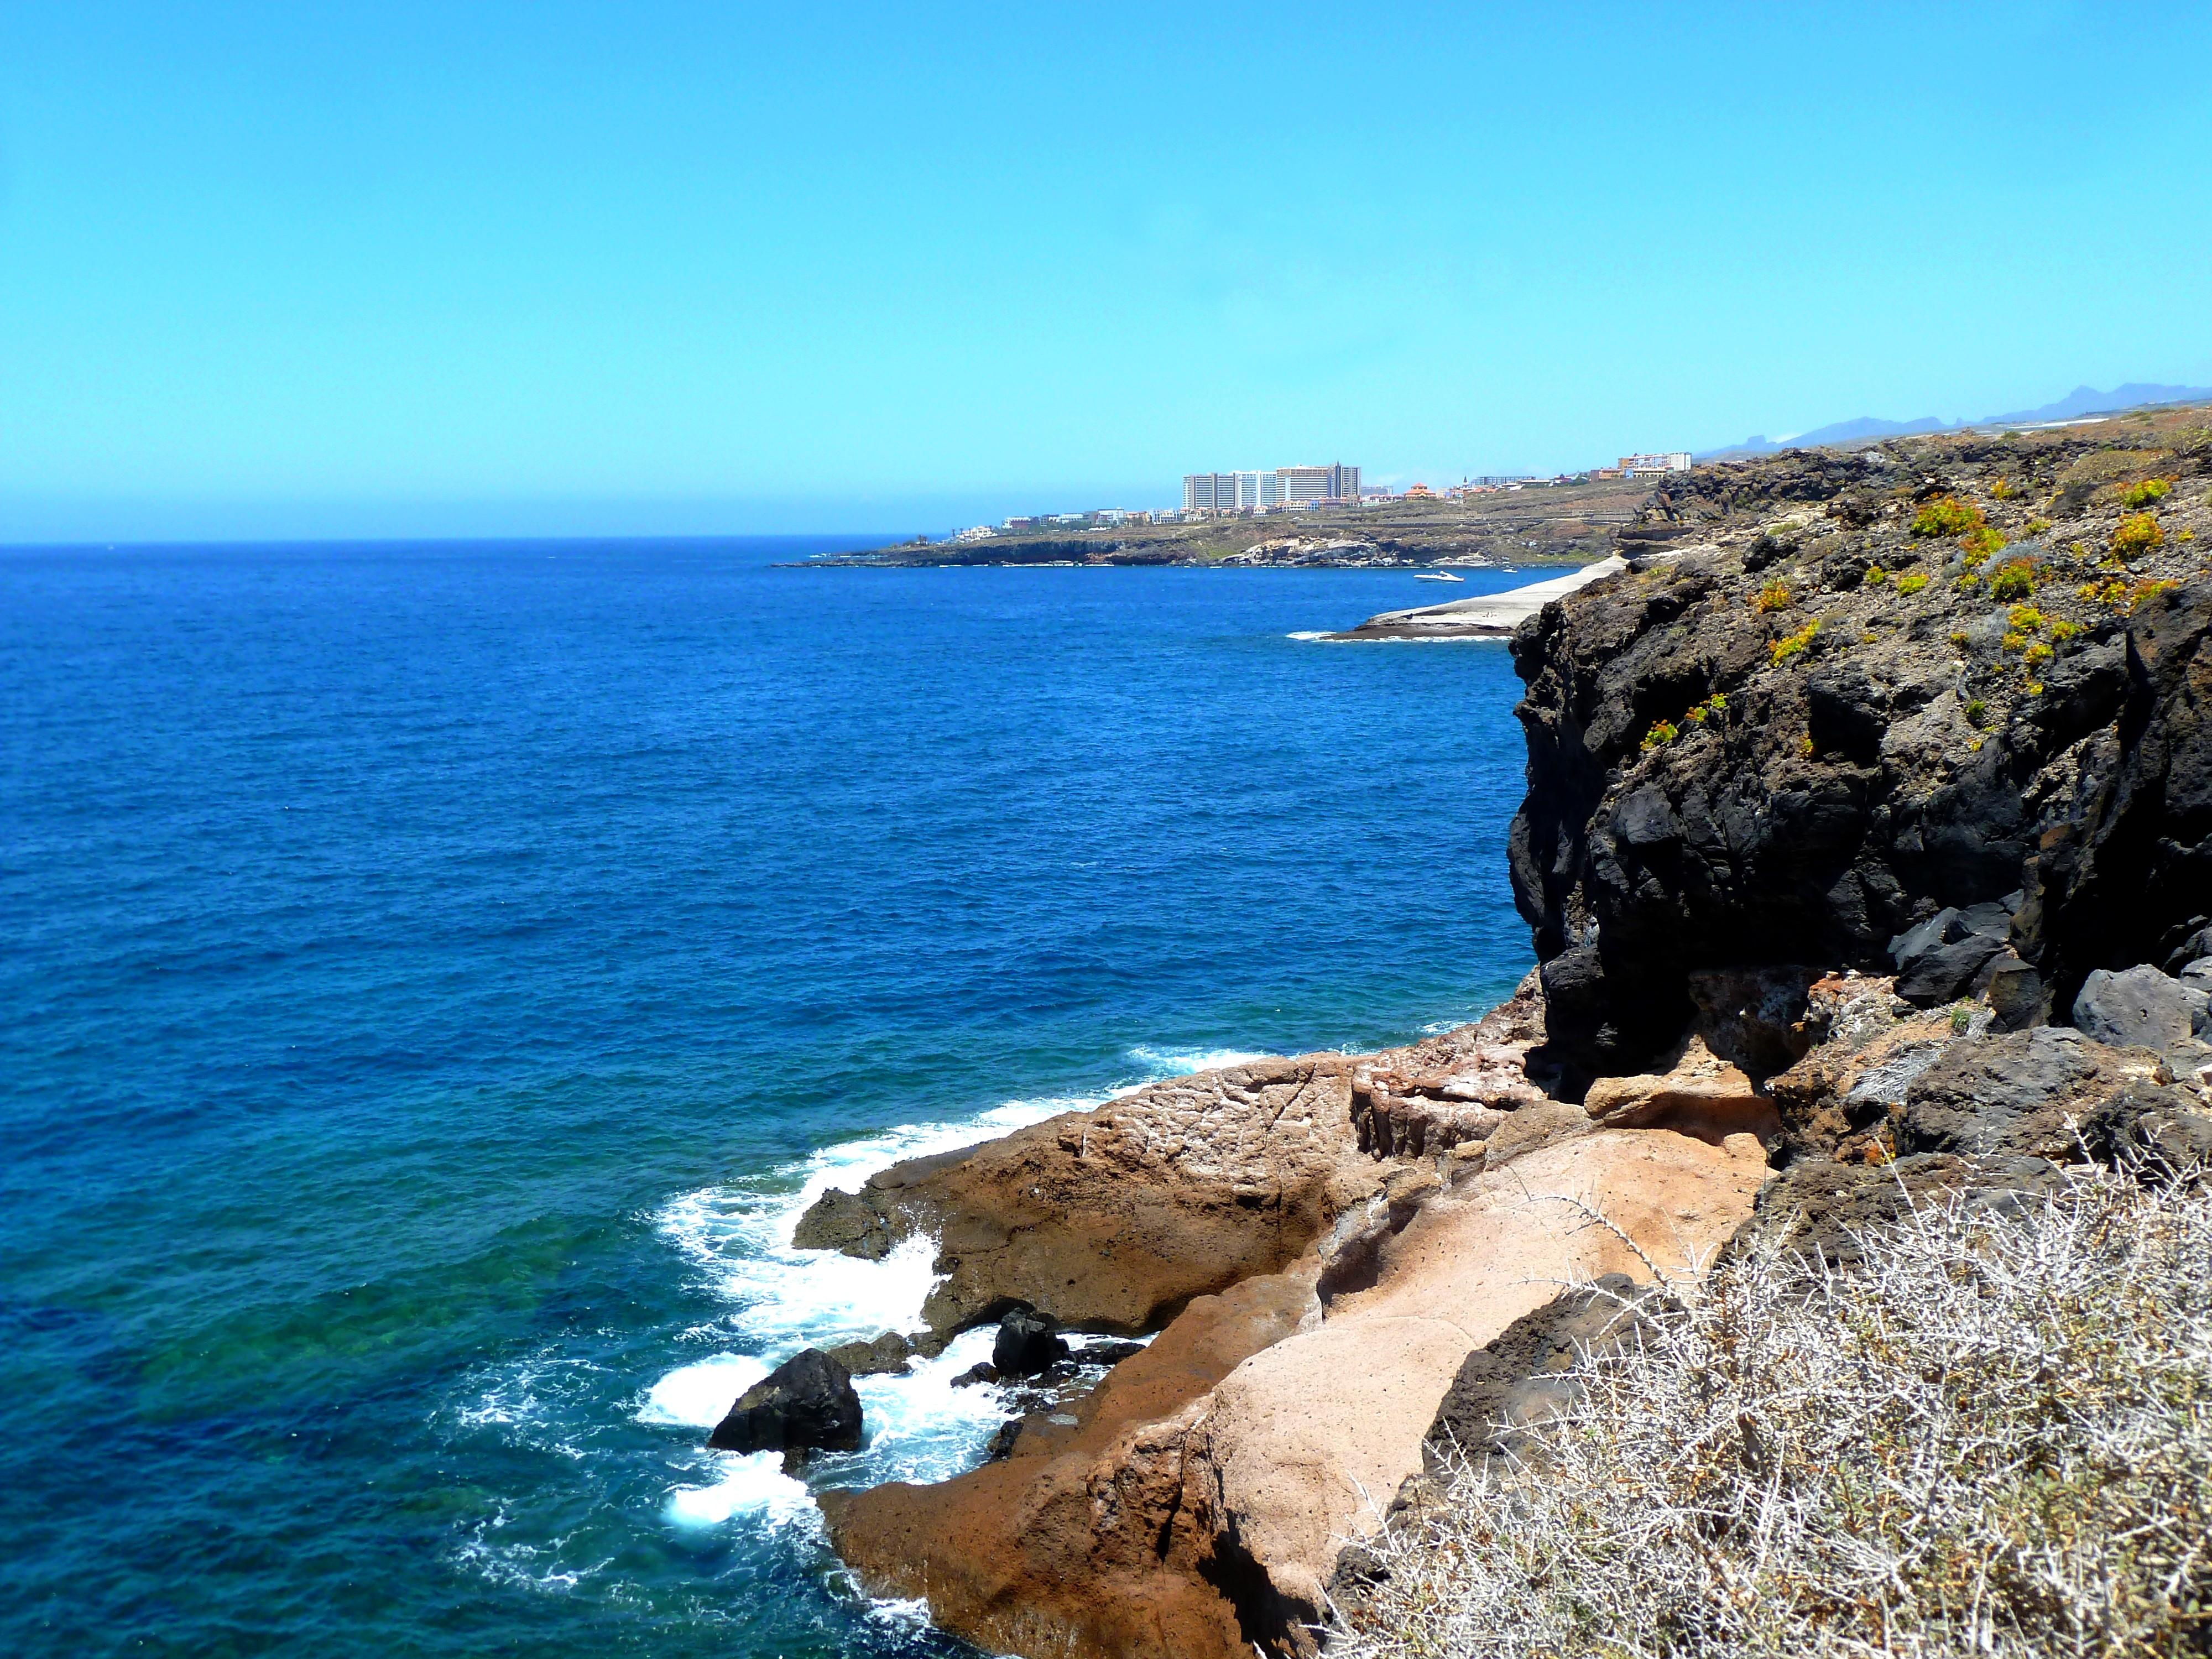 File Teneriffa Costa Adeje La Caleta Blick Nach Callao Salvaje Panoramio Jpg Wikimedia Commons